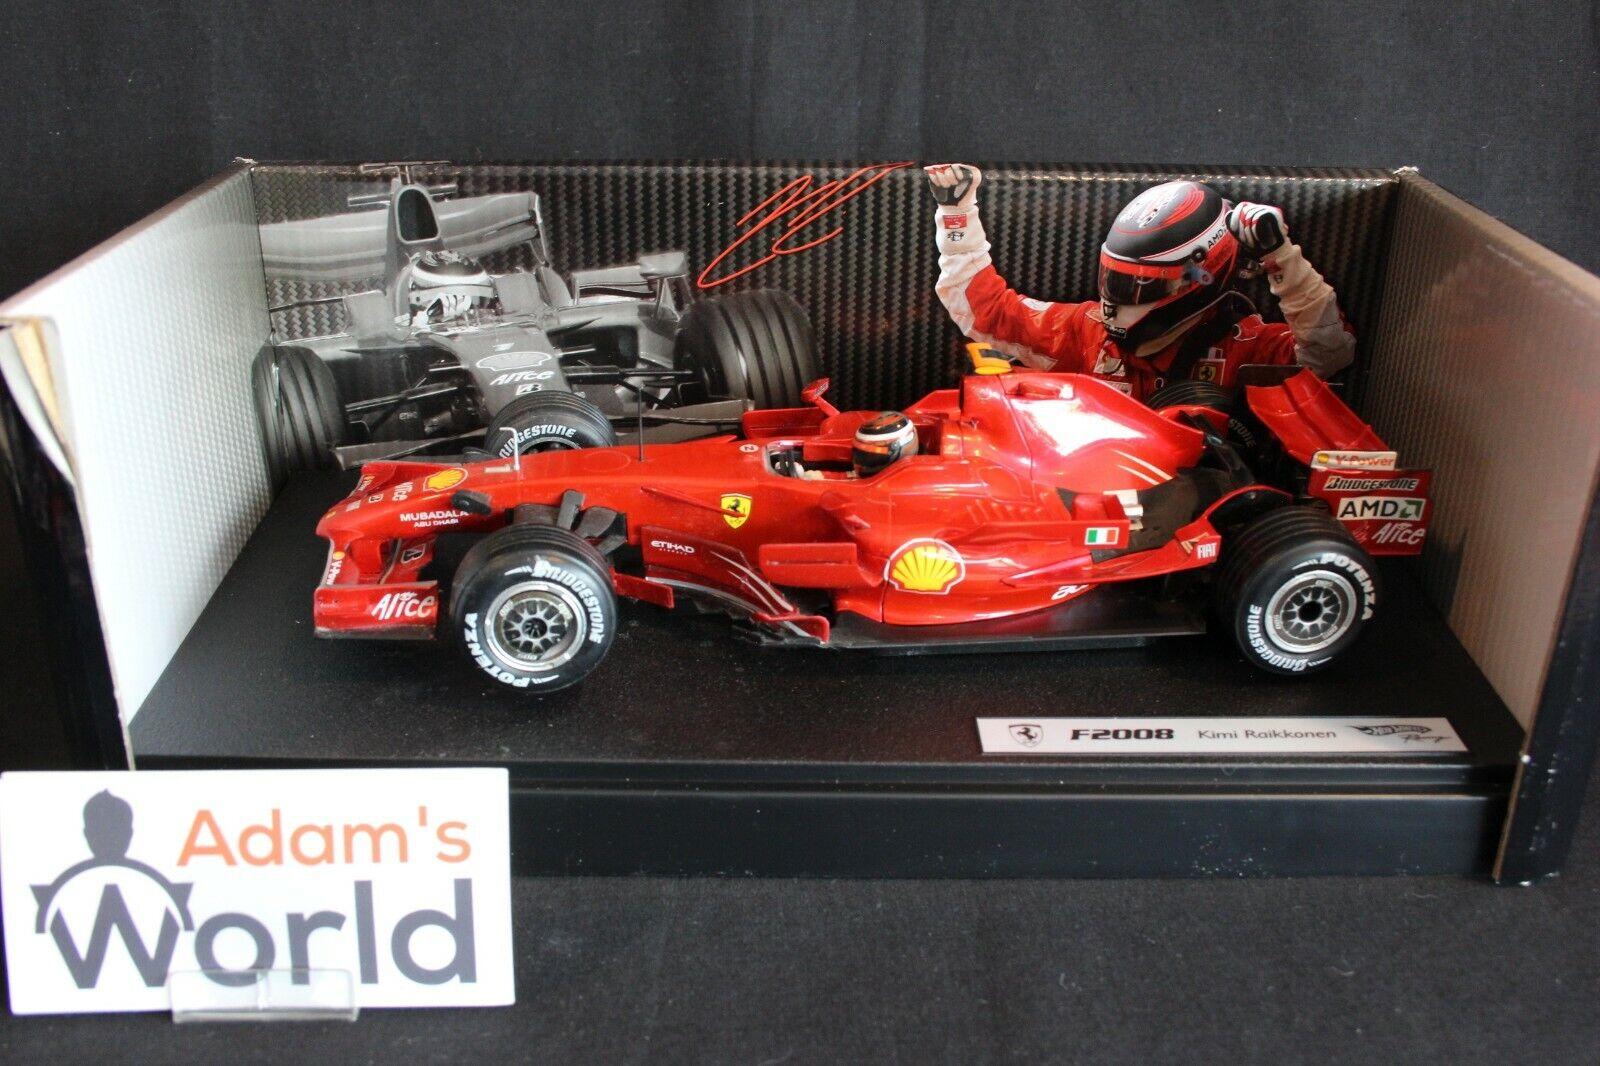 Hot Wheels Ferrari F2008 2008 1 18 Kimi Raikkonen (FIN) (PJBB)